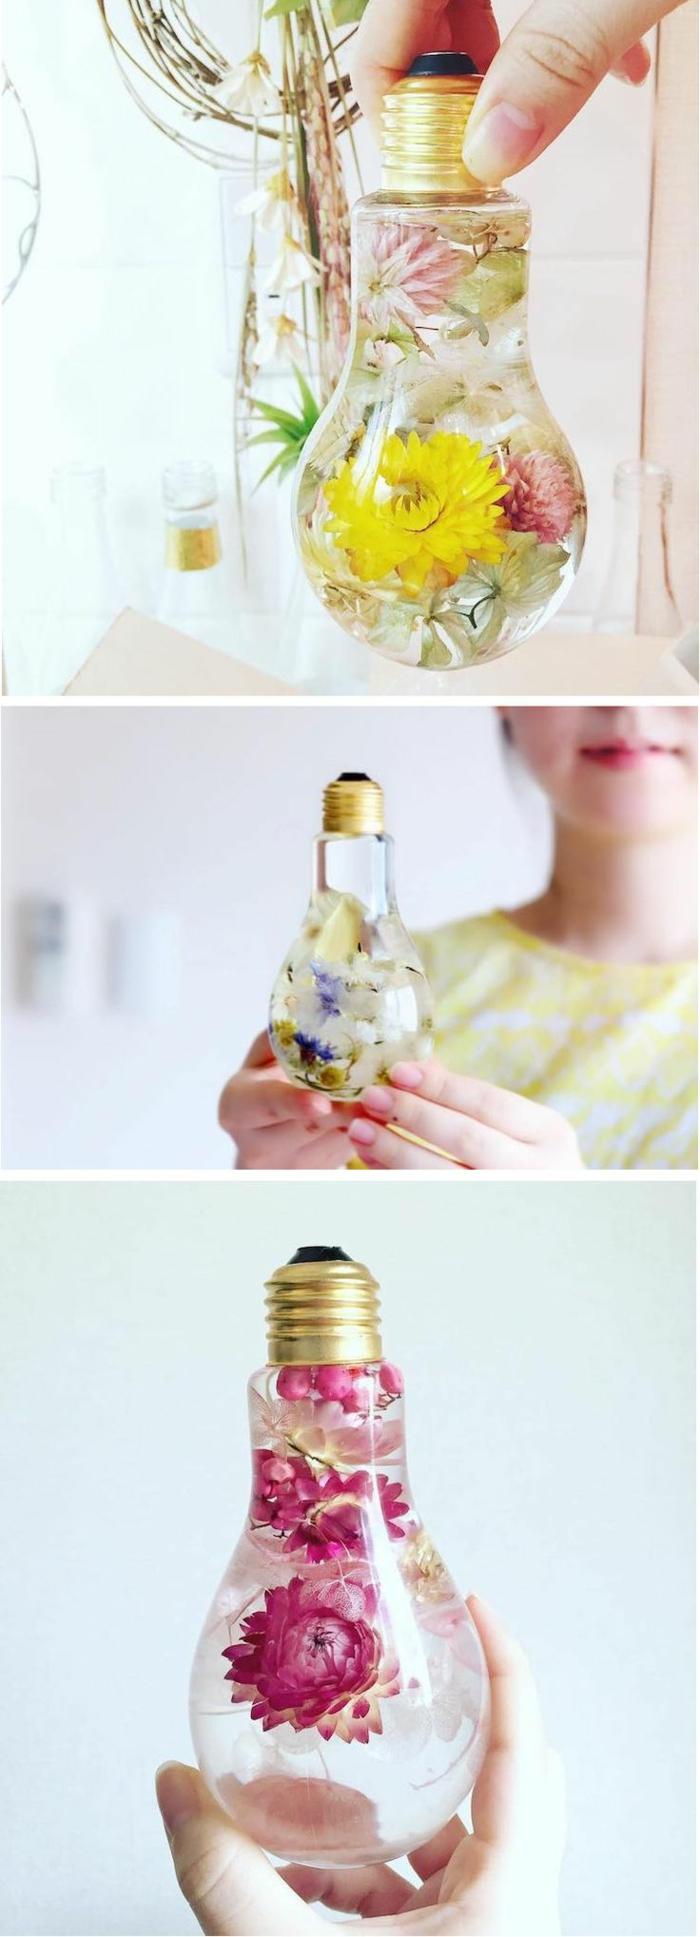 manualidades paso a paso, decoración con bombilla llena de flores